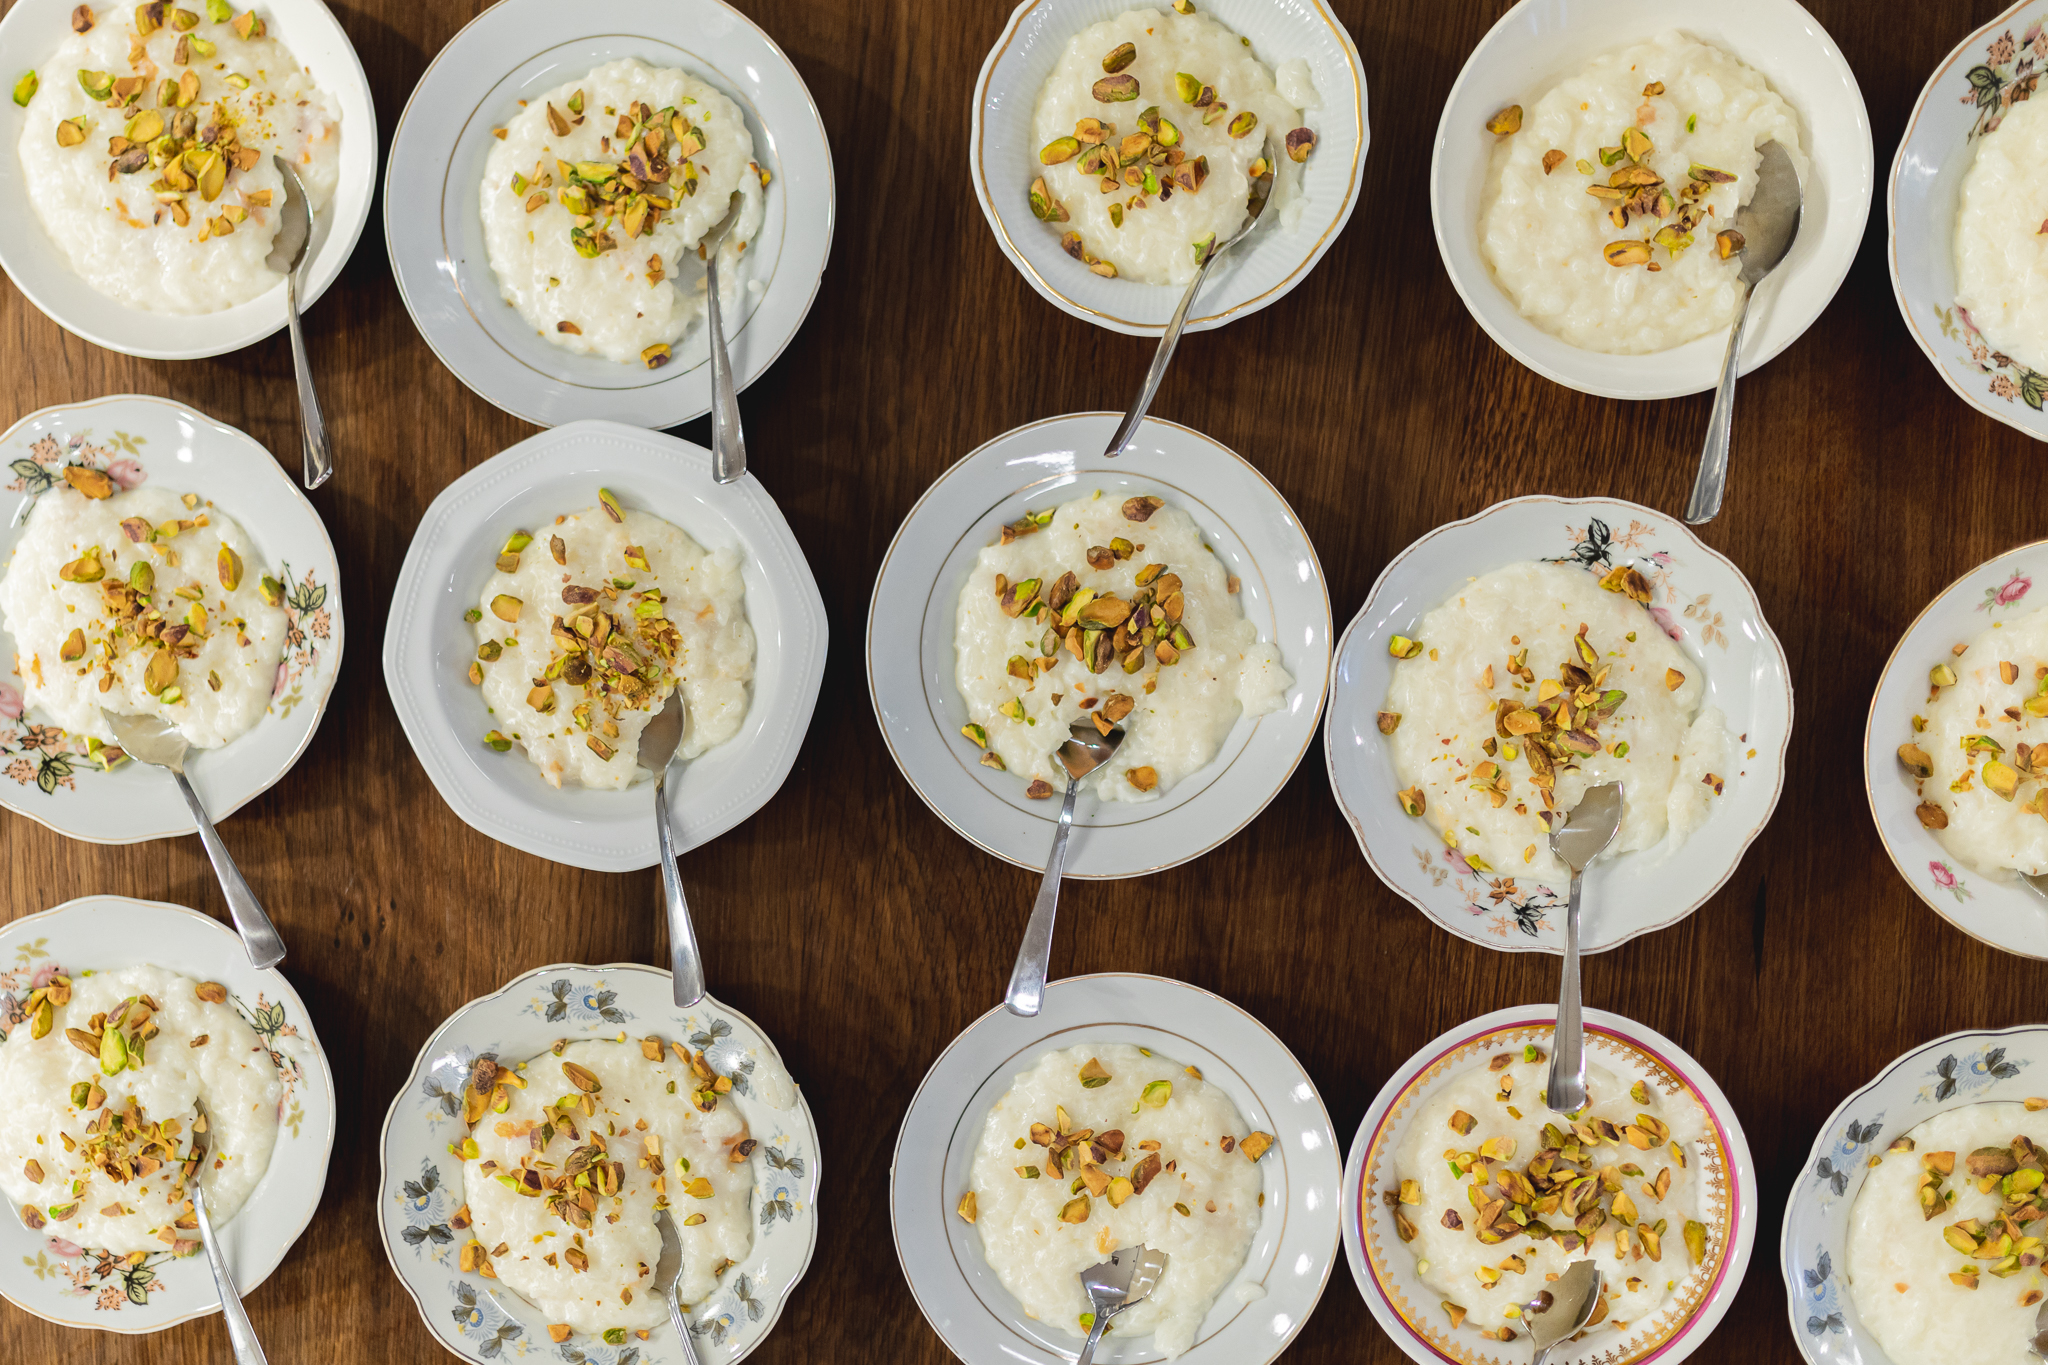 صحون شخصيه تحوي ارز بحليب وعليها فستق حلبي